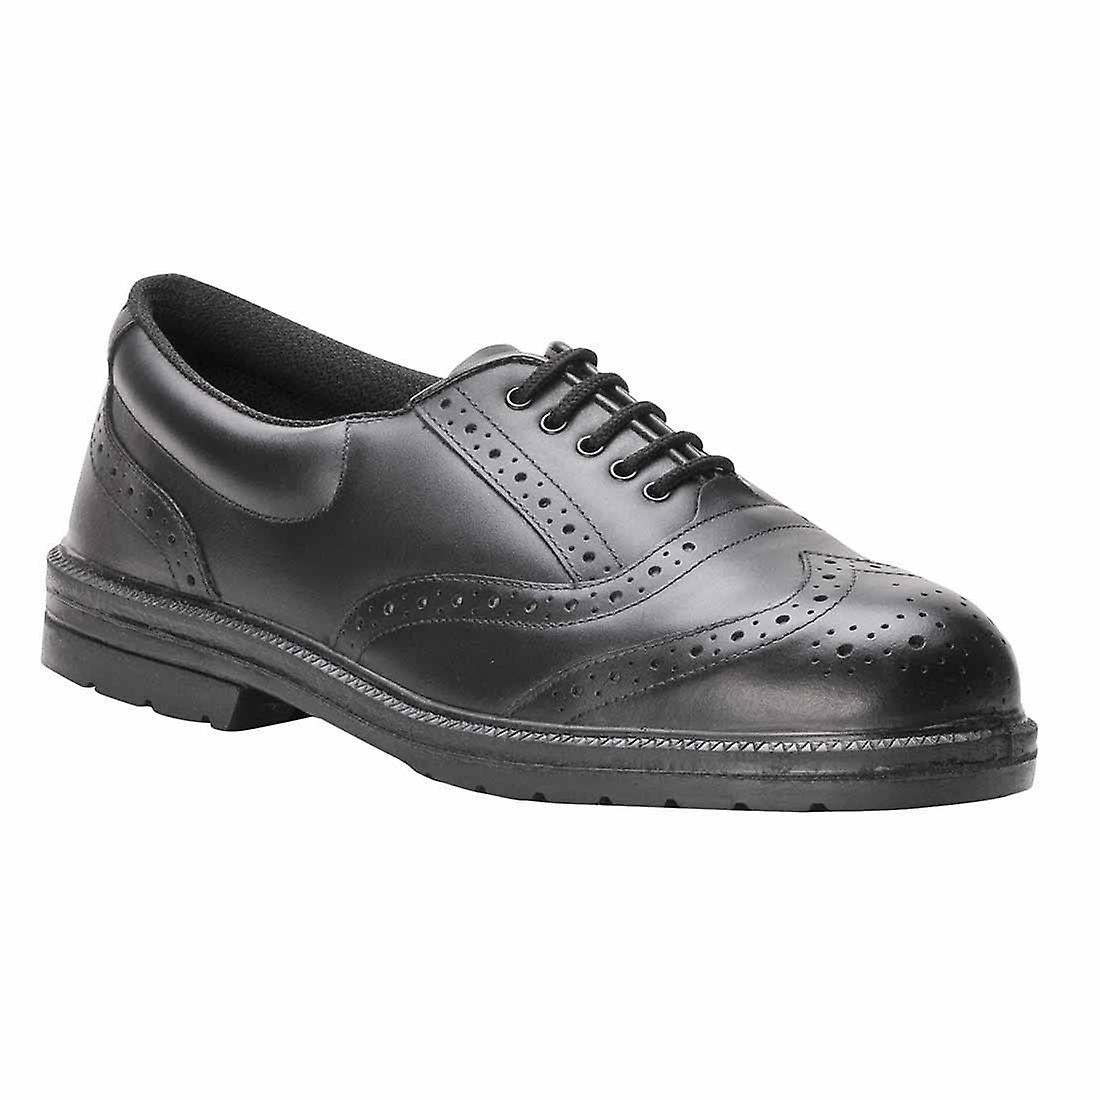 sUw - Steelite Executive Workwear Safety Brogue Shoe S1P